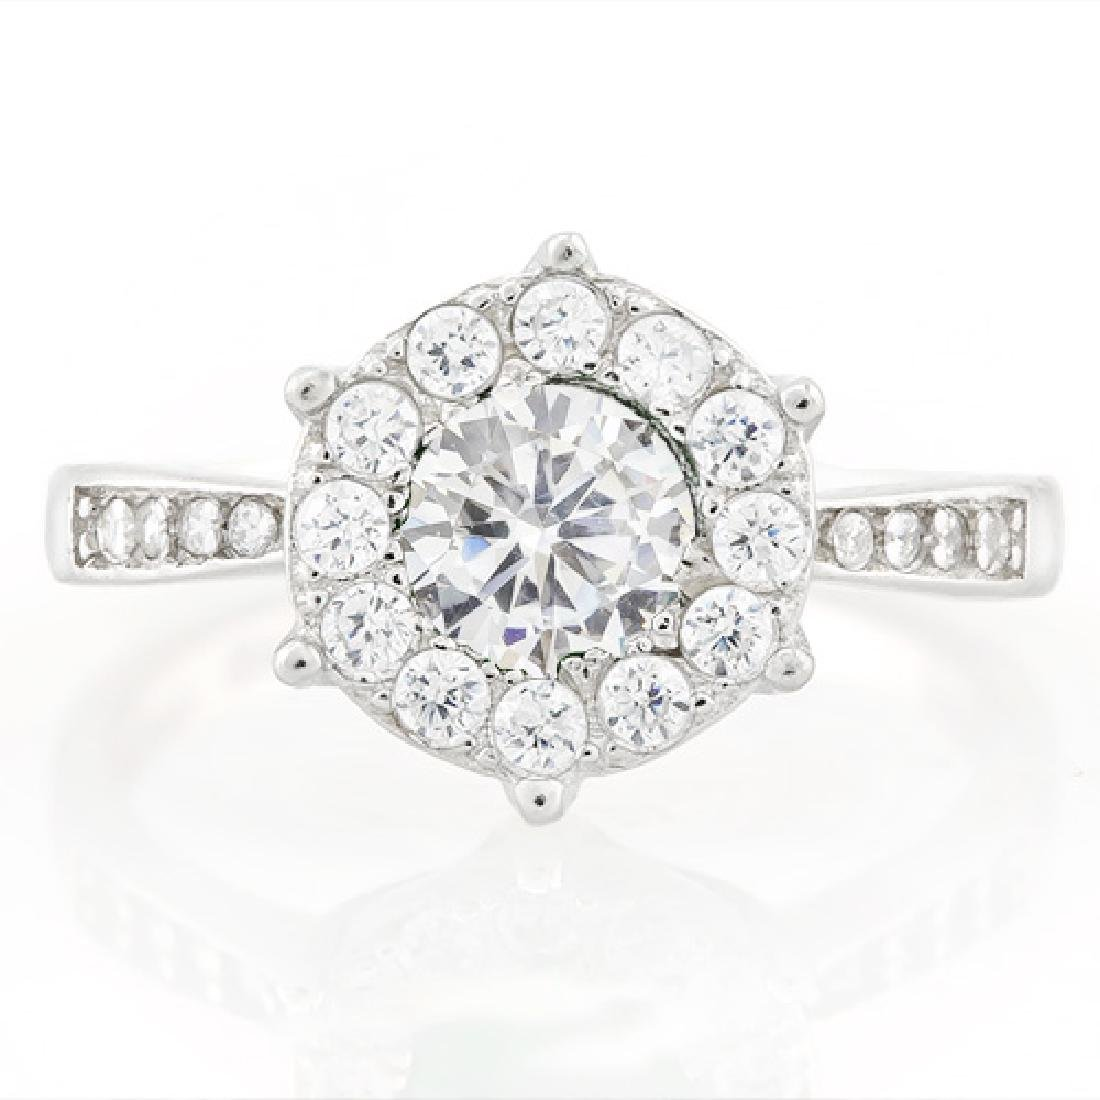 1 1/4 CARAT (25 PCS) FLAWLESS CREATED DIAMOND 925 STERL